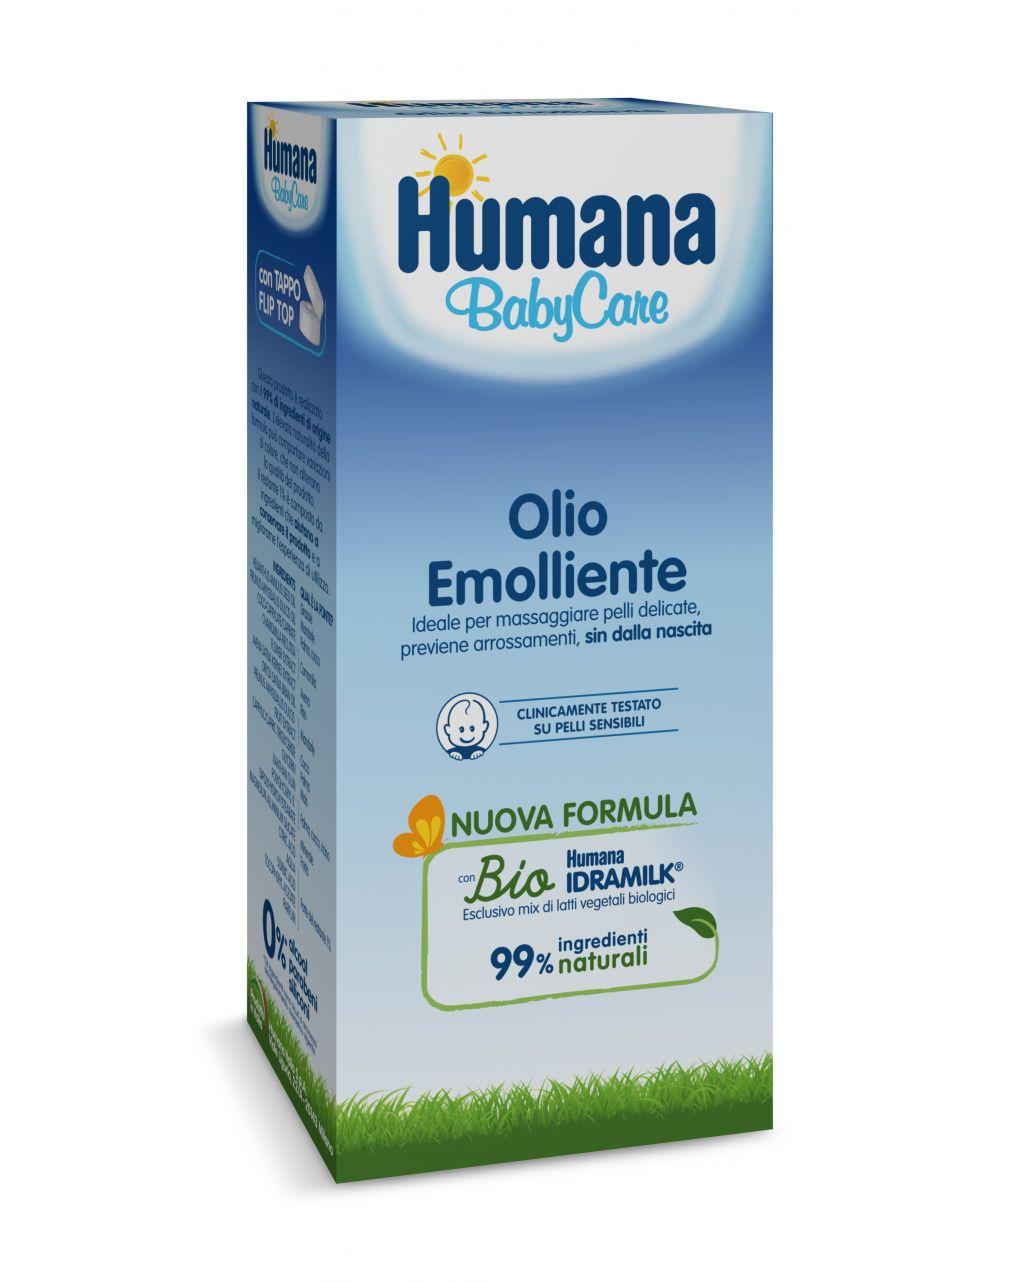 Olio emolliente 250 ml - Humana Baby Care